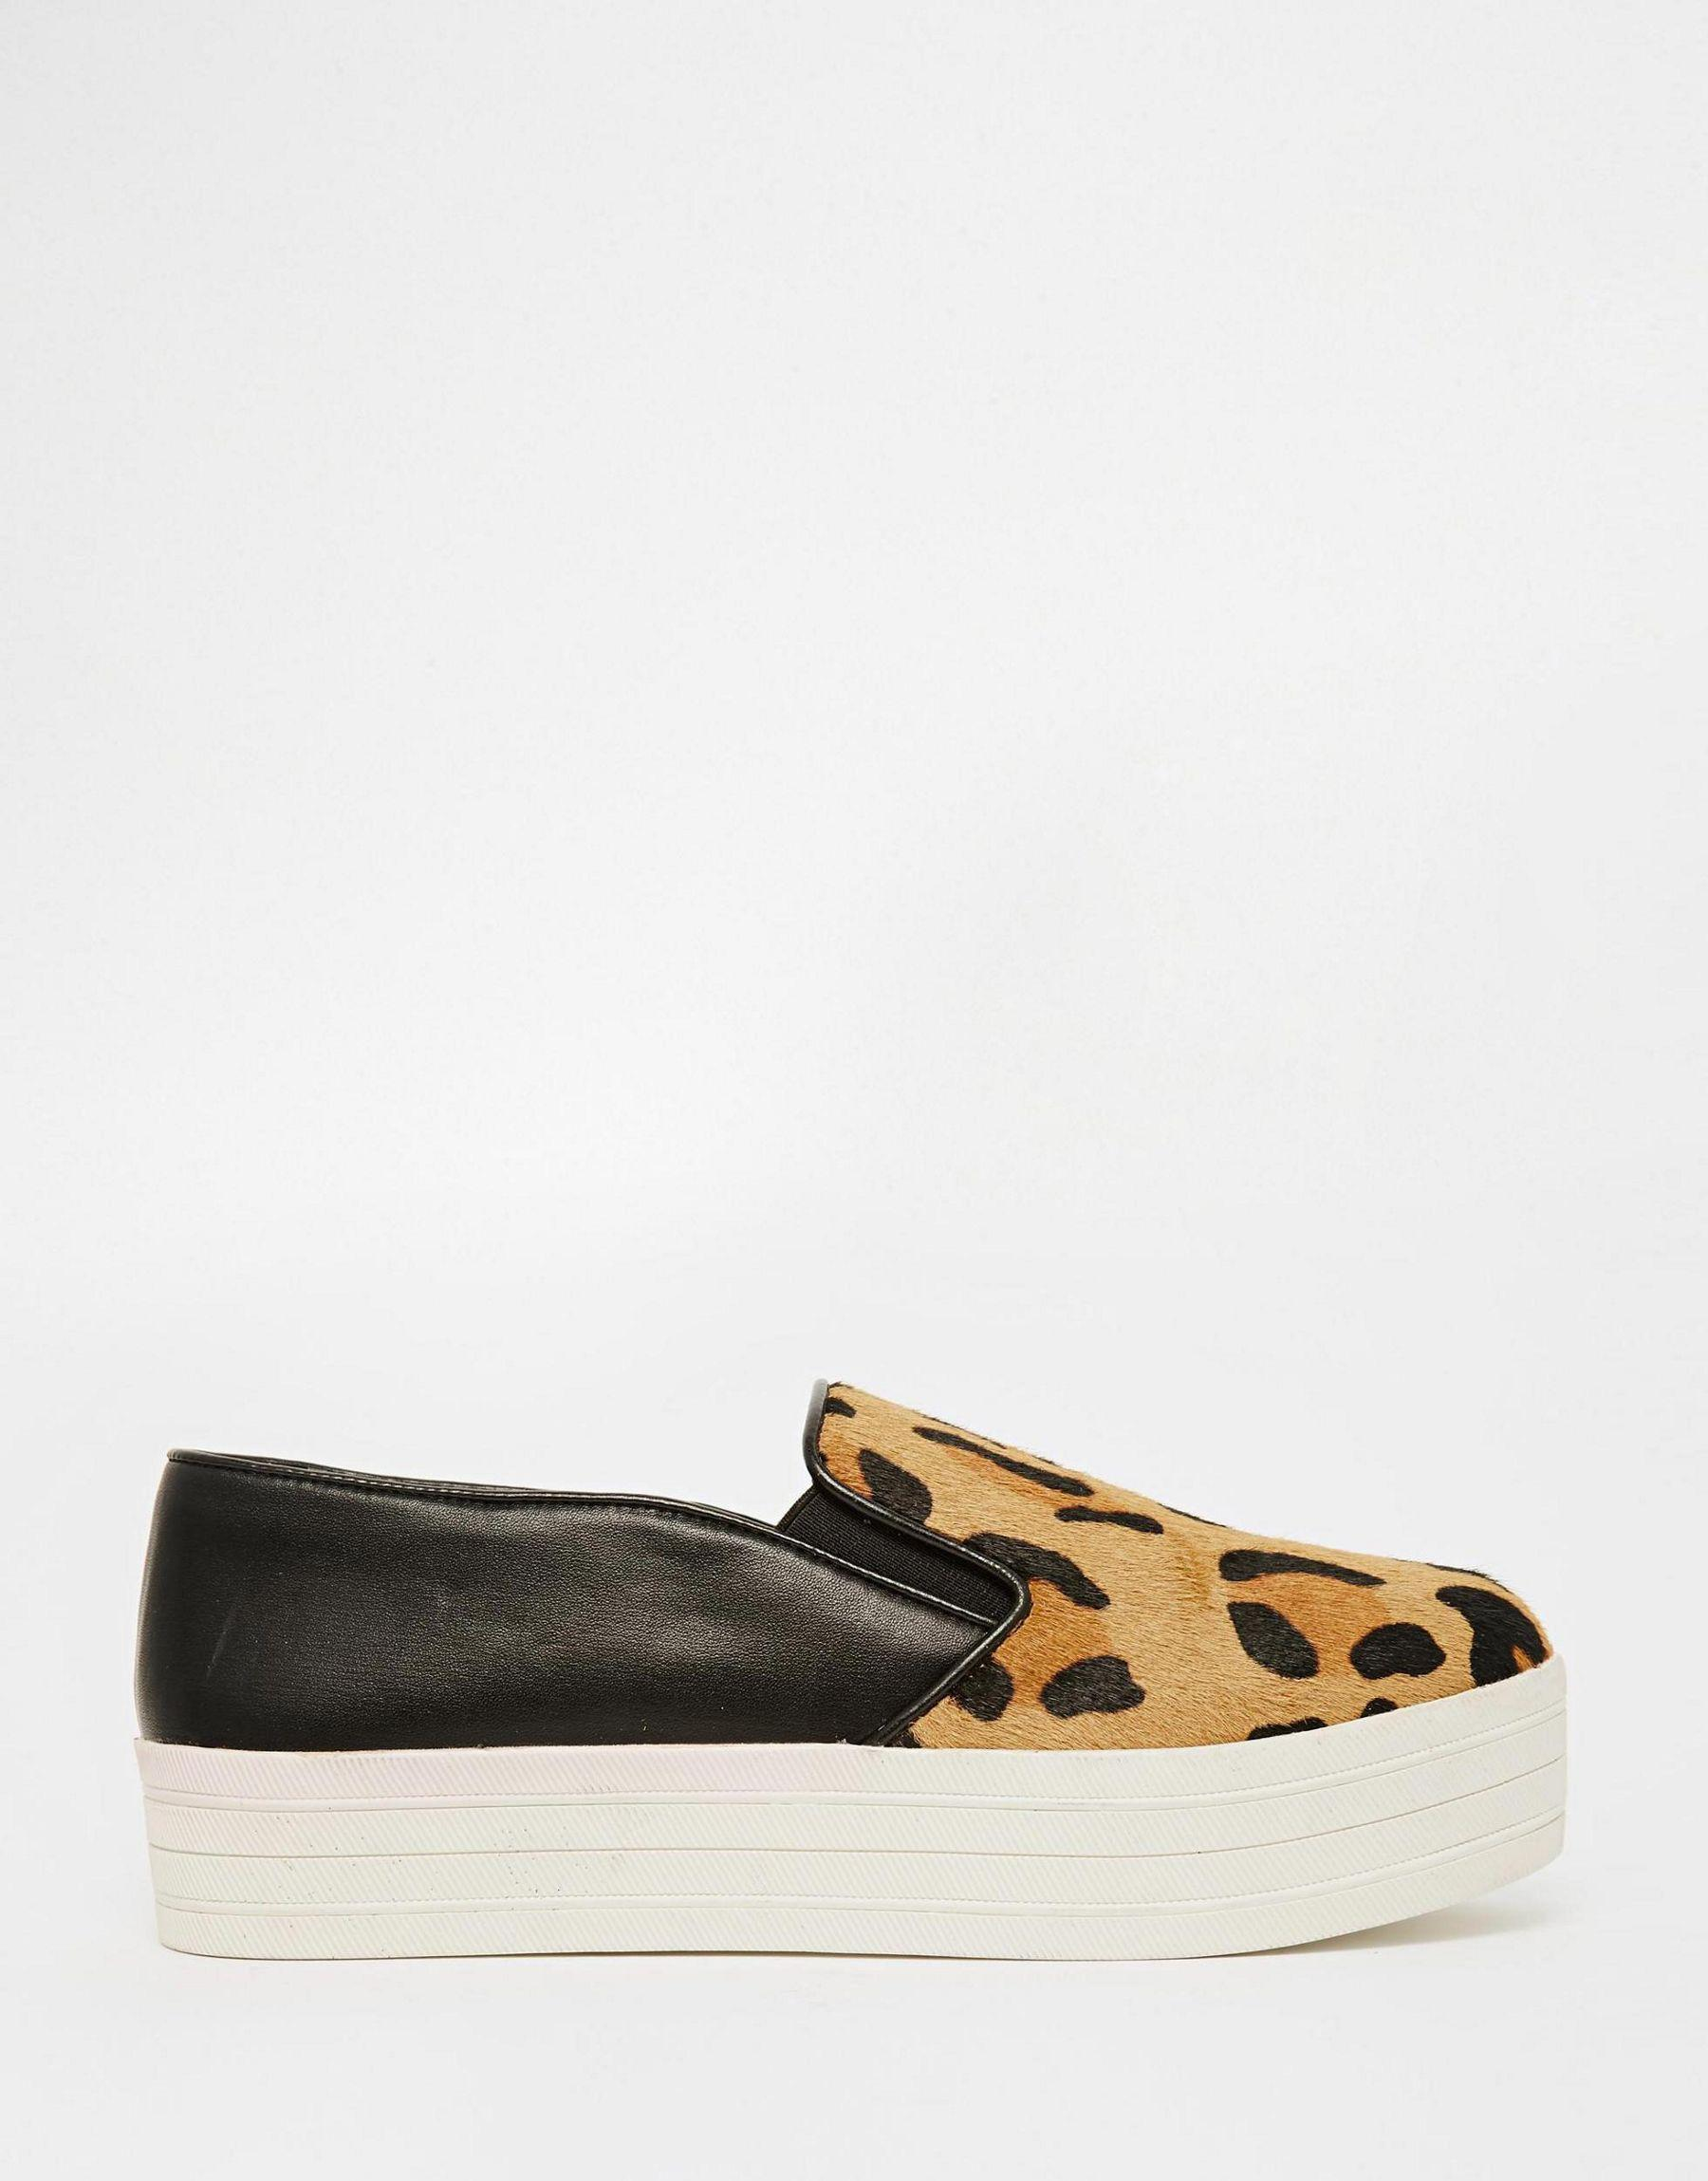 Buy Women Shoes / Steve Madden Buhba Animal Print Slip On Trainers